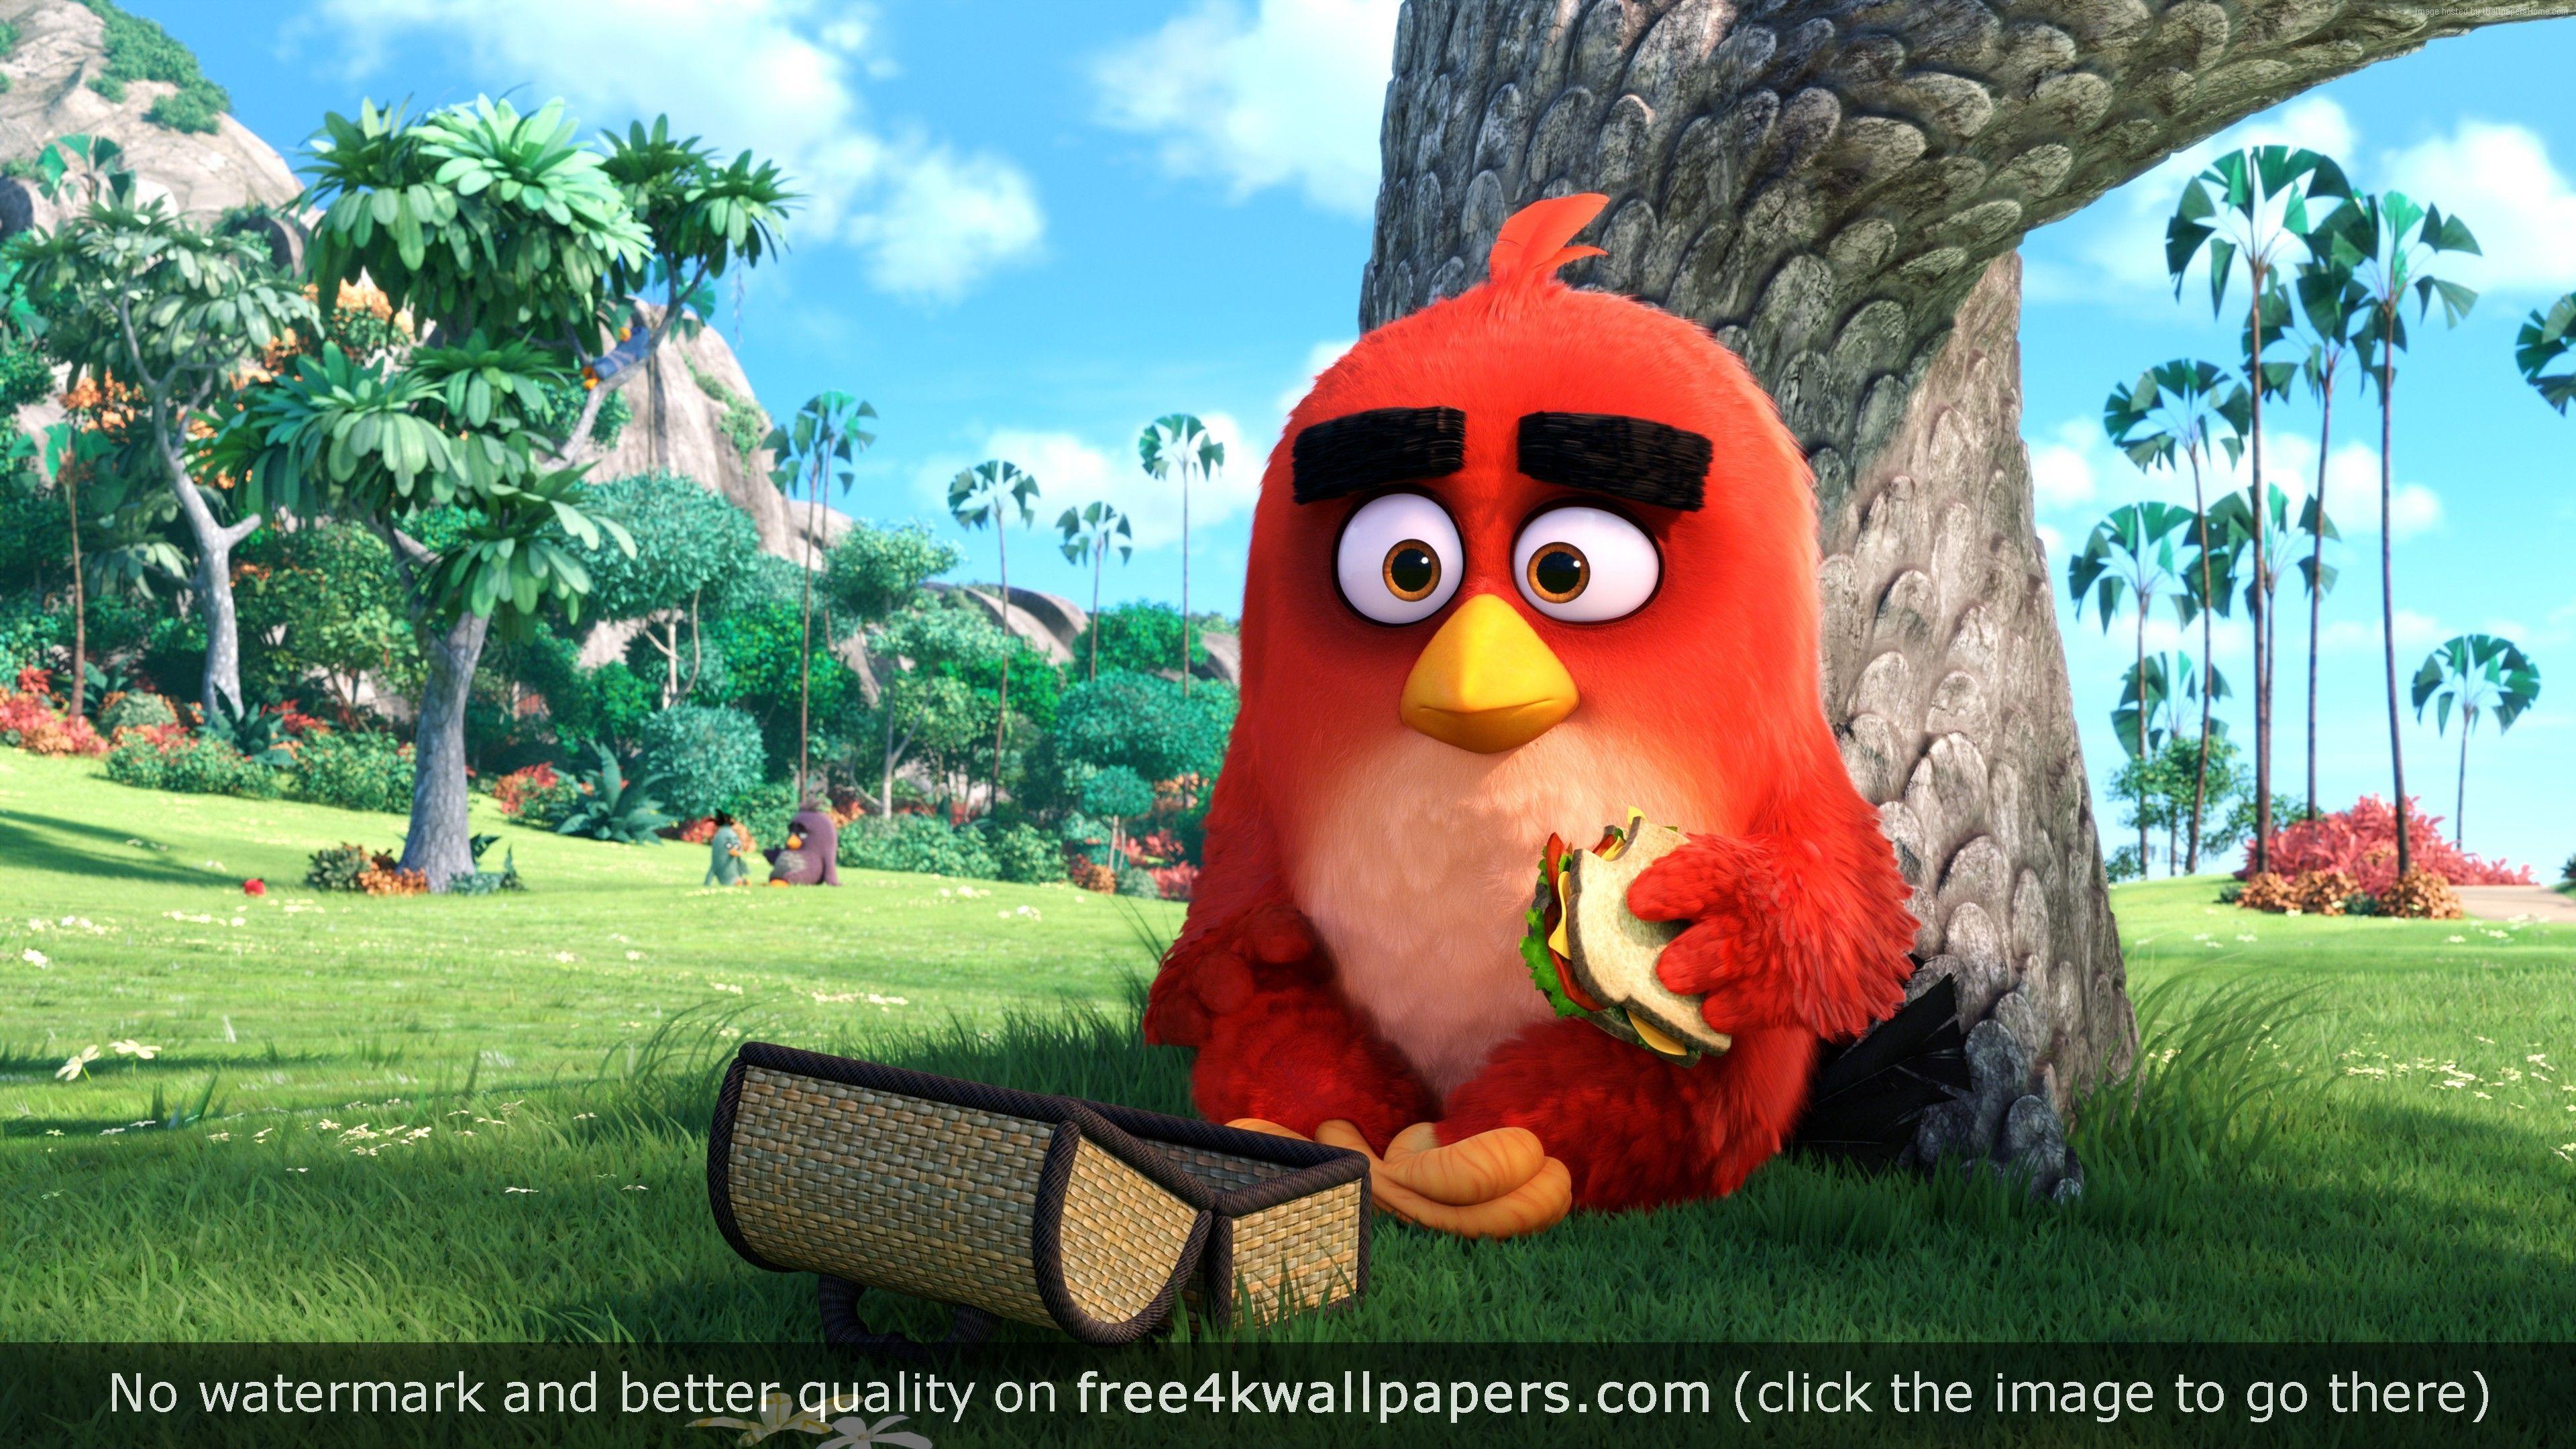 Red Angry Birds Movie 4k Wallpaper Angry Birds Movie Angry Birds Animated Movies